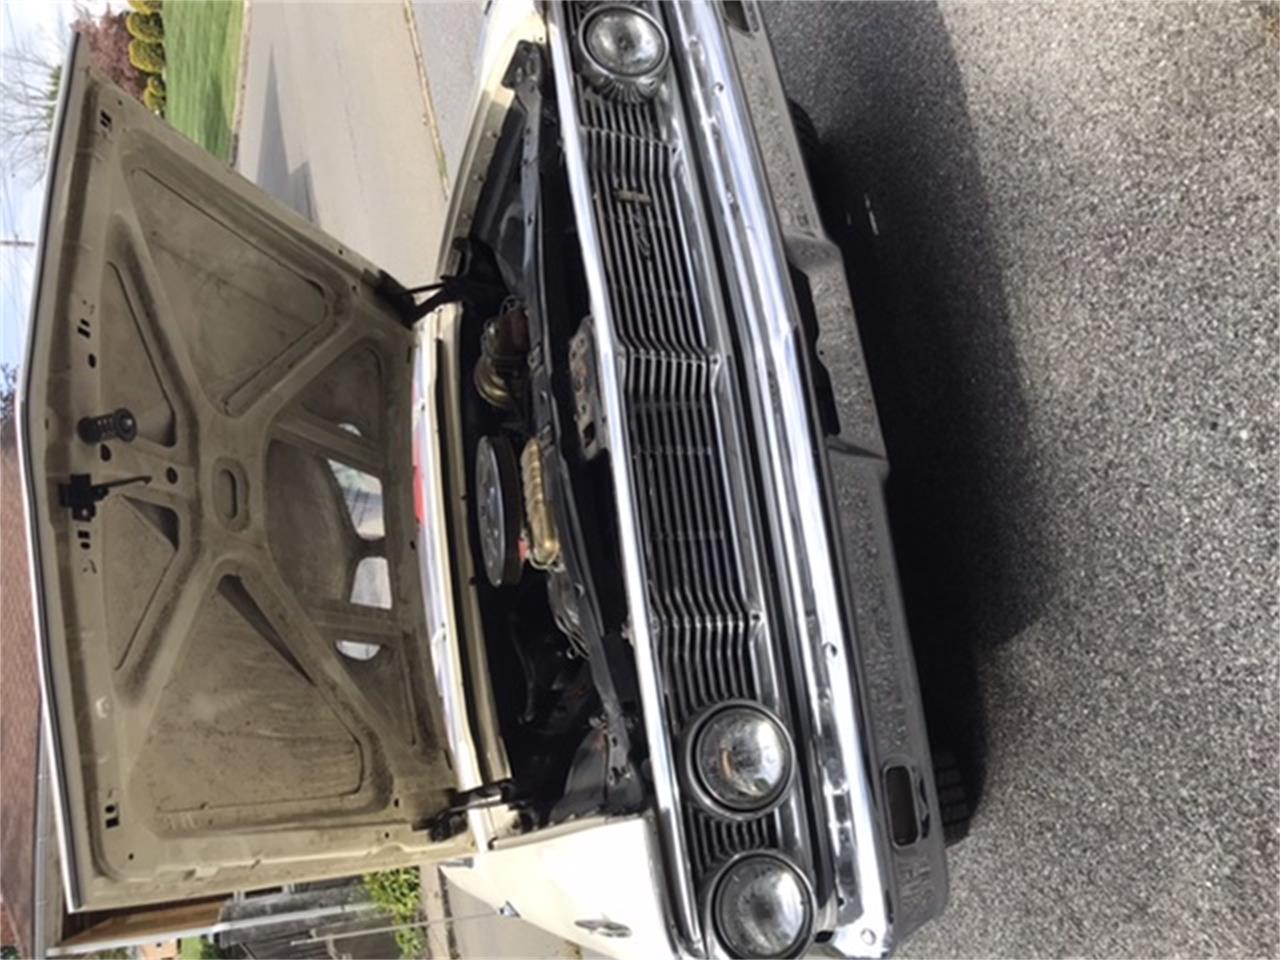 1964 Ford Galaxie 500 XL (CC-1392150) for sale in Pen Argyl, Pennsylvania